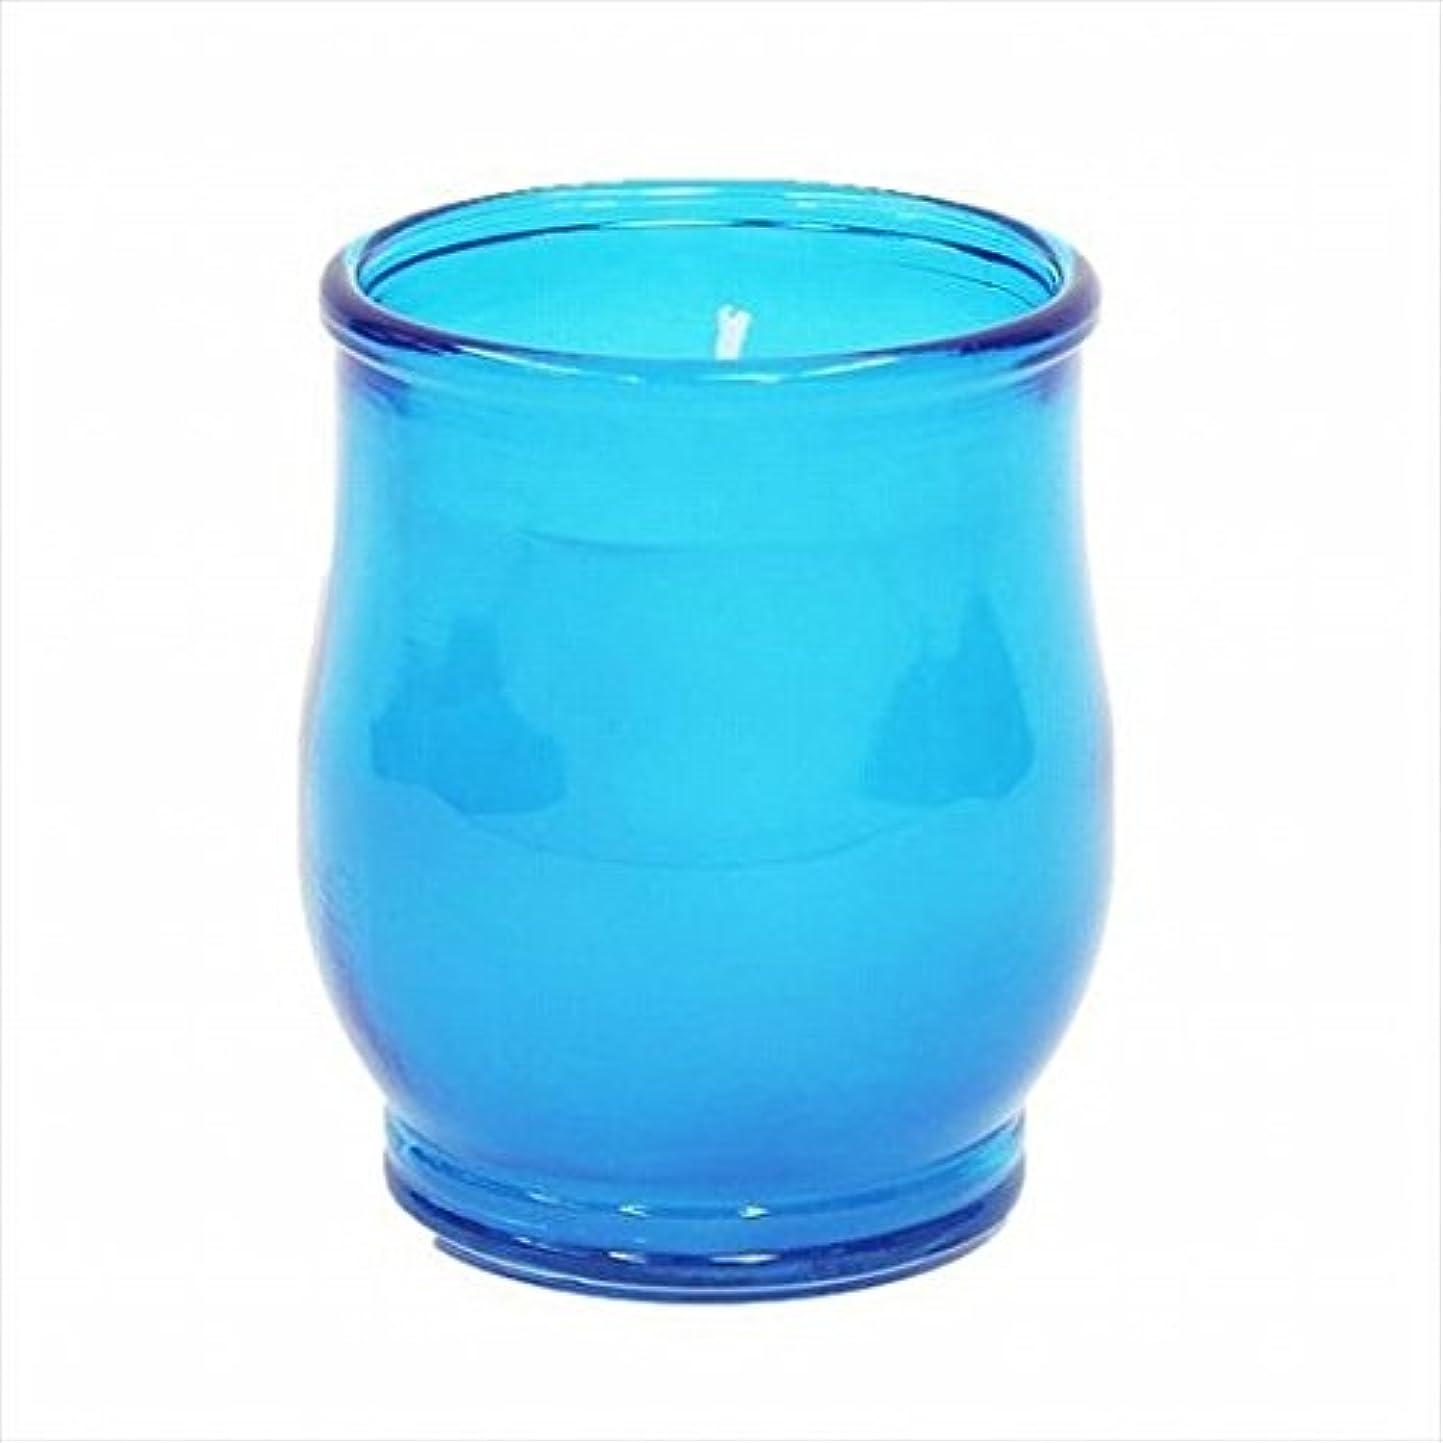 kameyama candle(カメヤマキャンドル) ポシェ(非常用コップローソク) 「 ブルー 」 キャンドル 68x68x80mm (73020000BL)